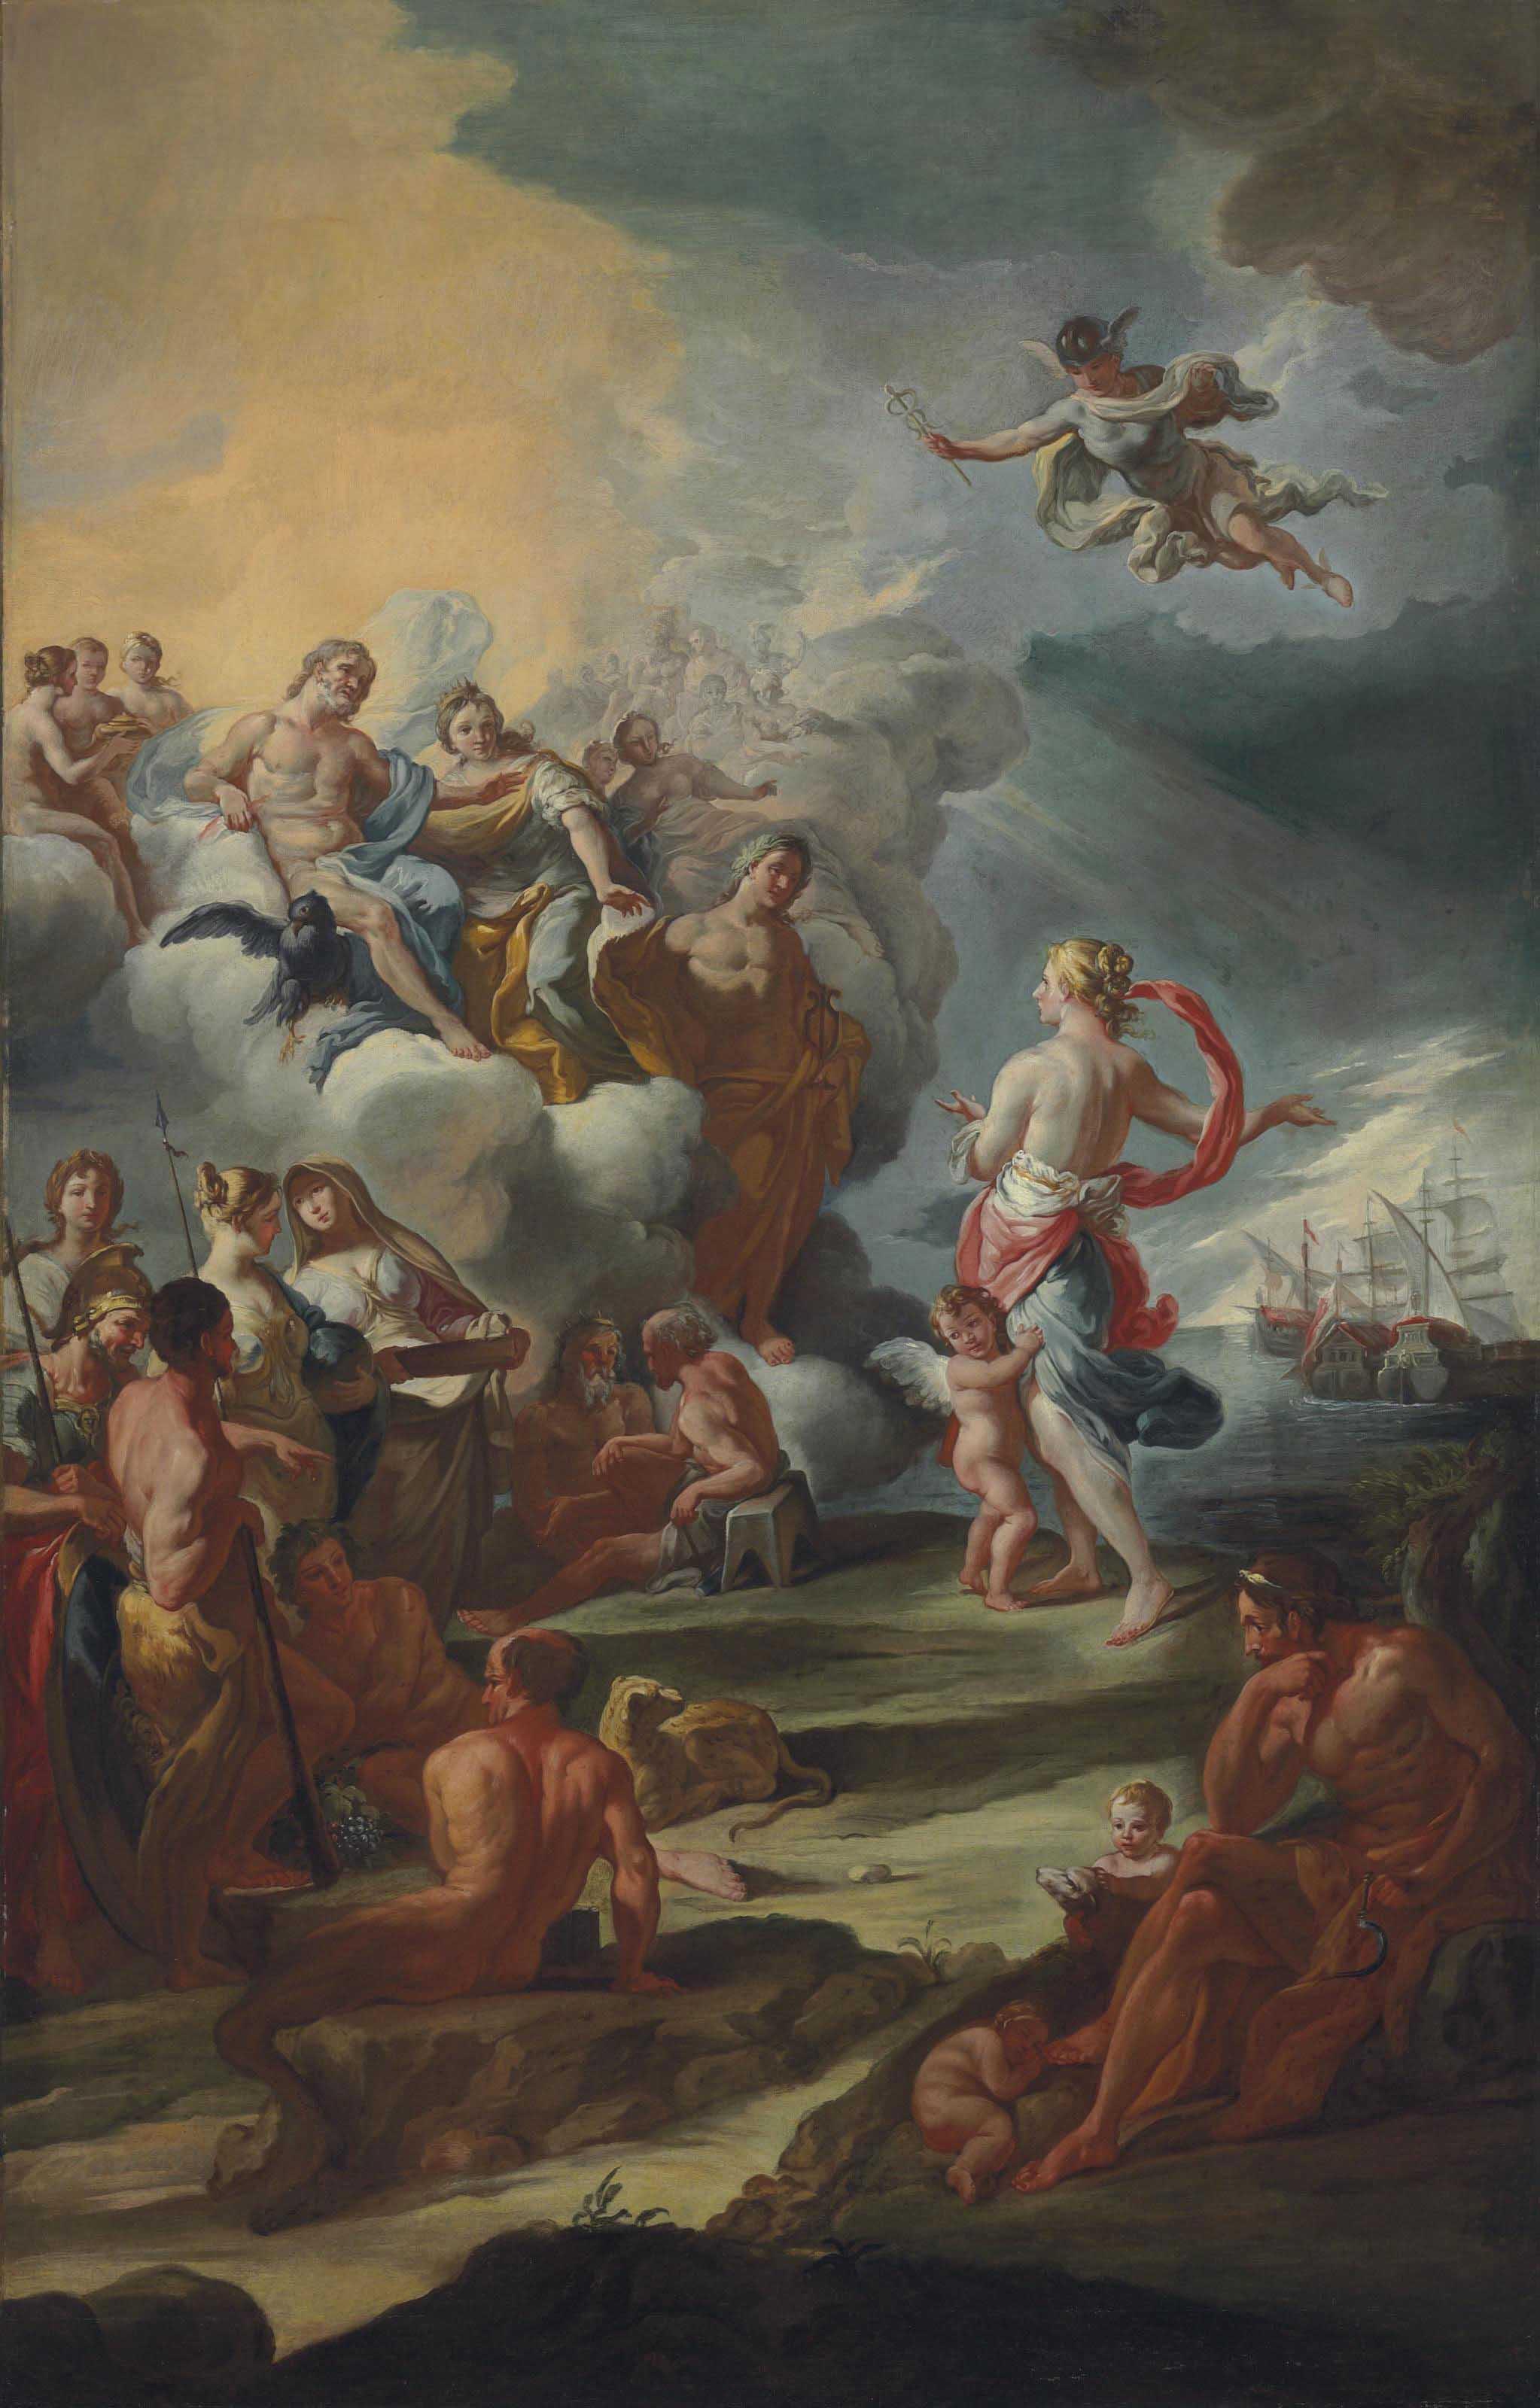 Venus appealing to Jupiter, Juno and Apollo on behalf of a fleet